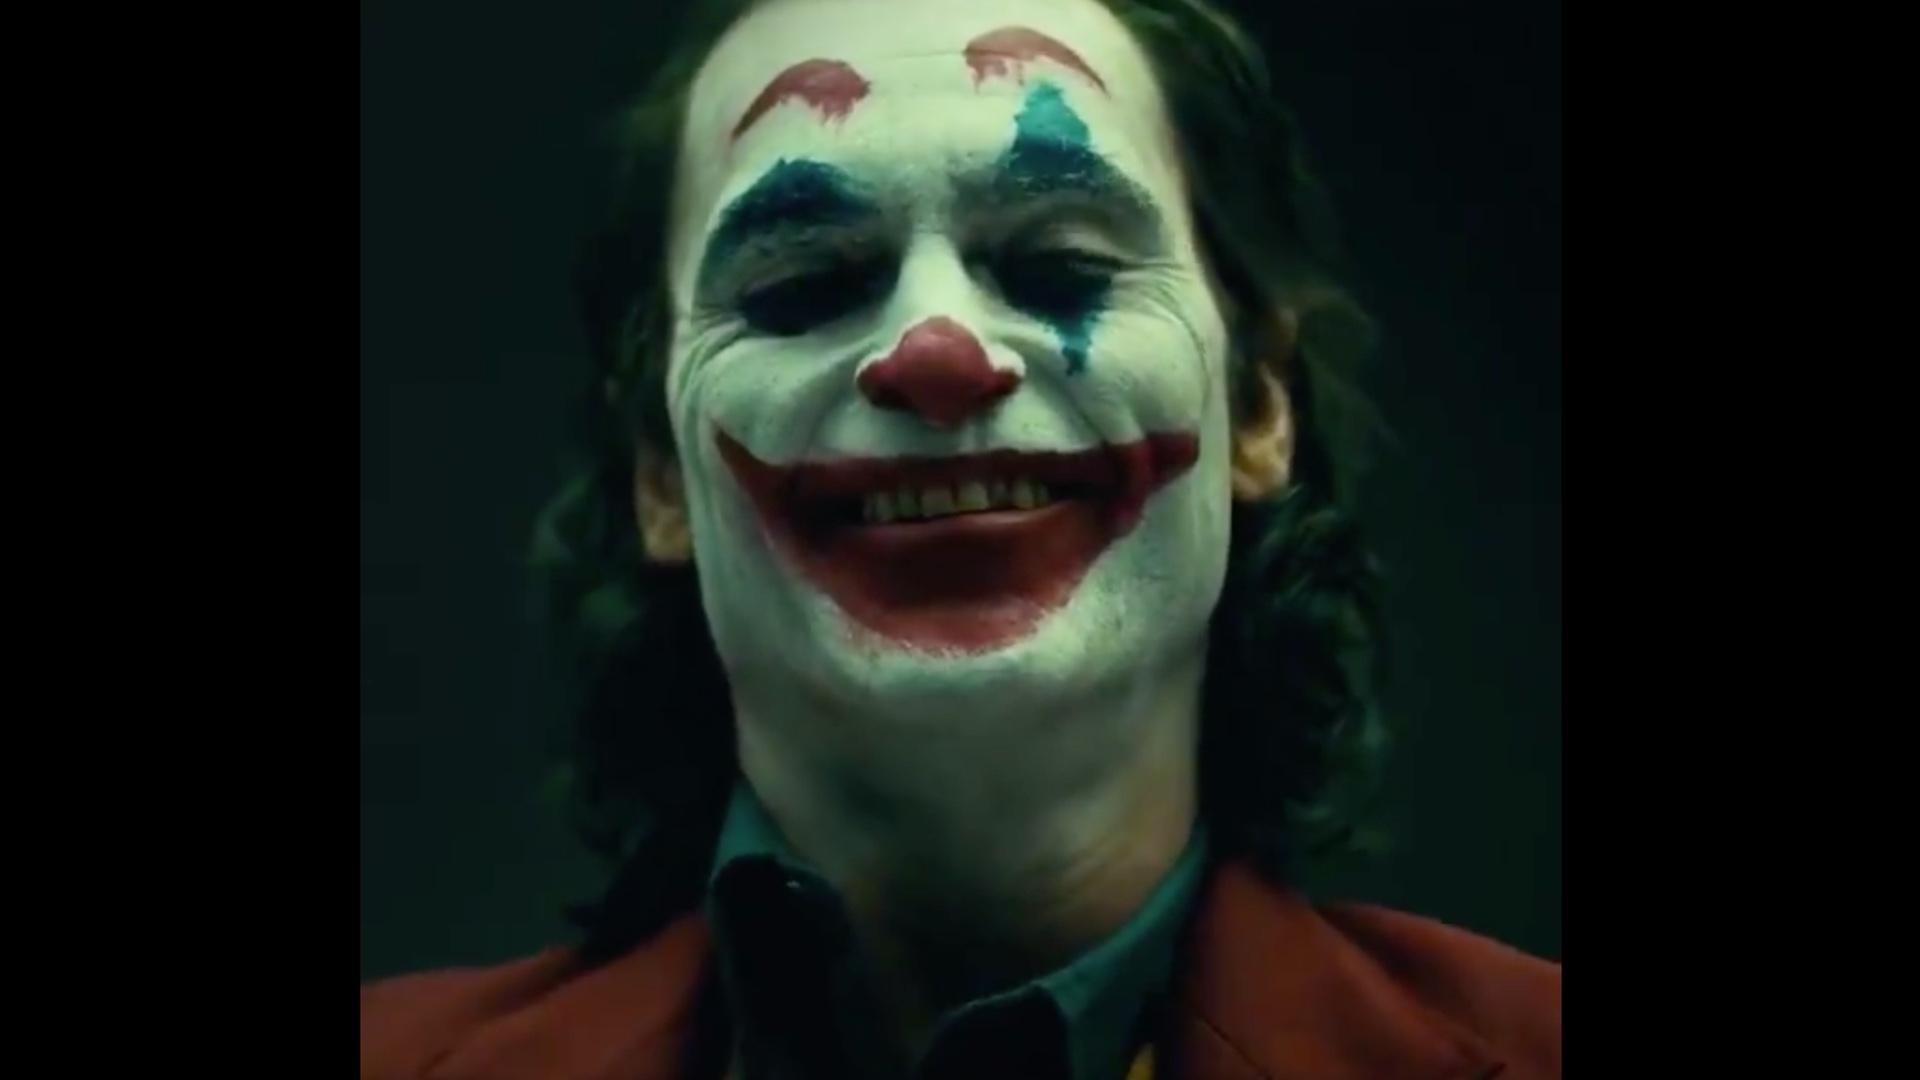 New Joker Set Photos And Video Shows Joaquin Phoenix In